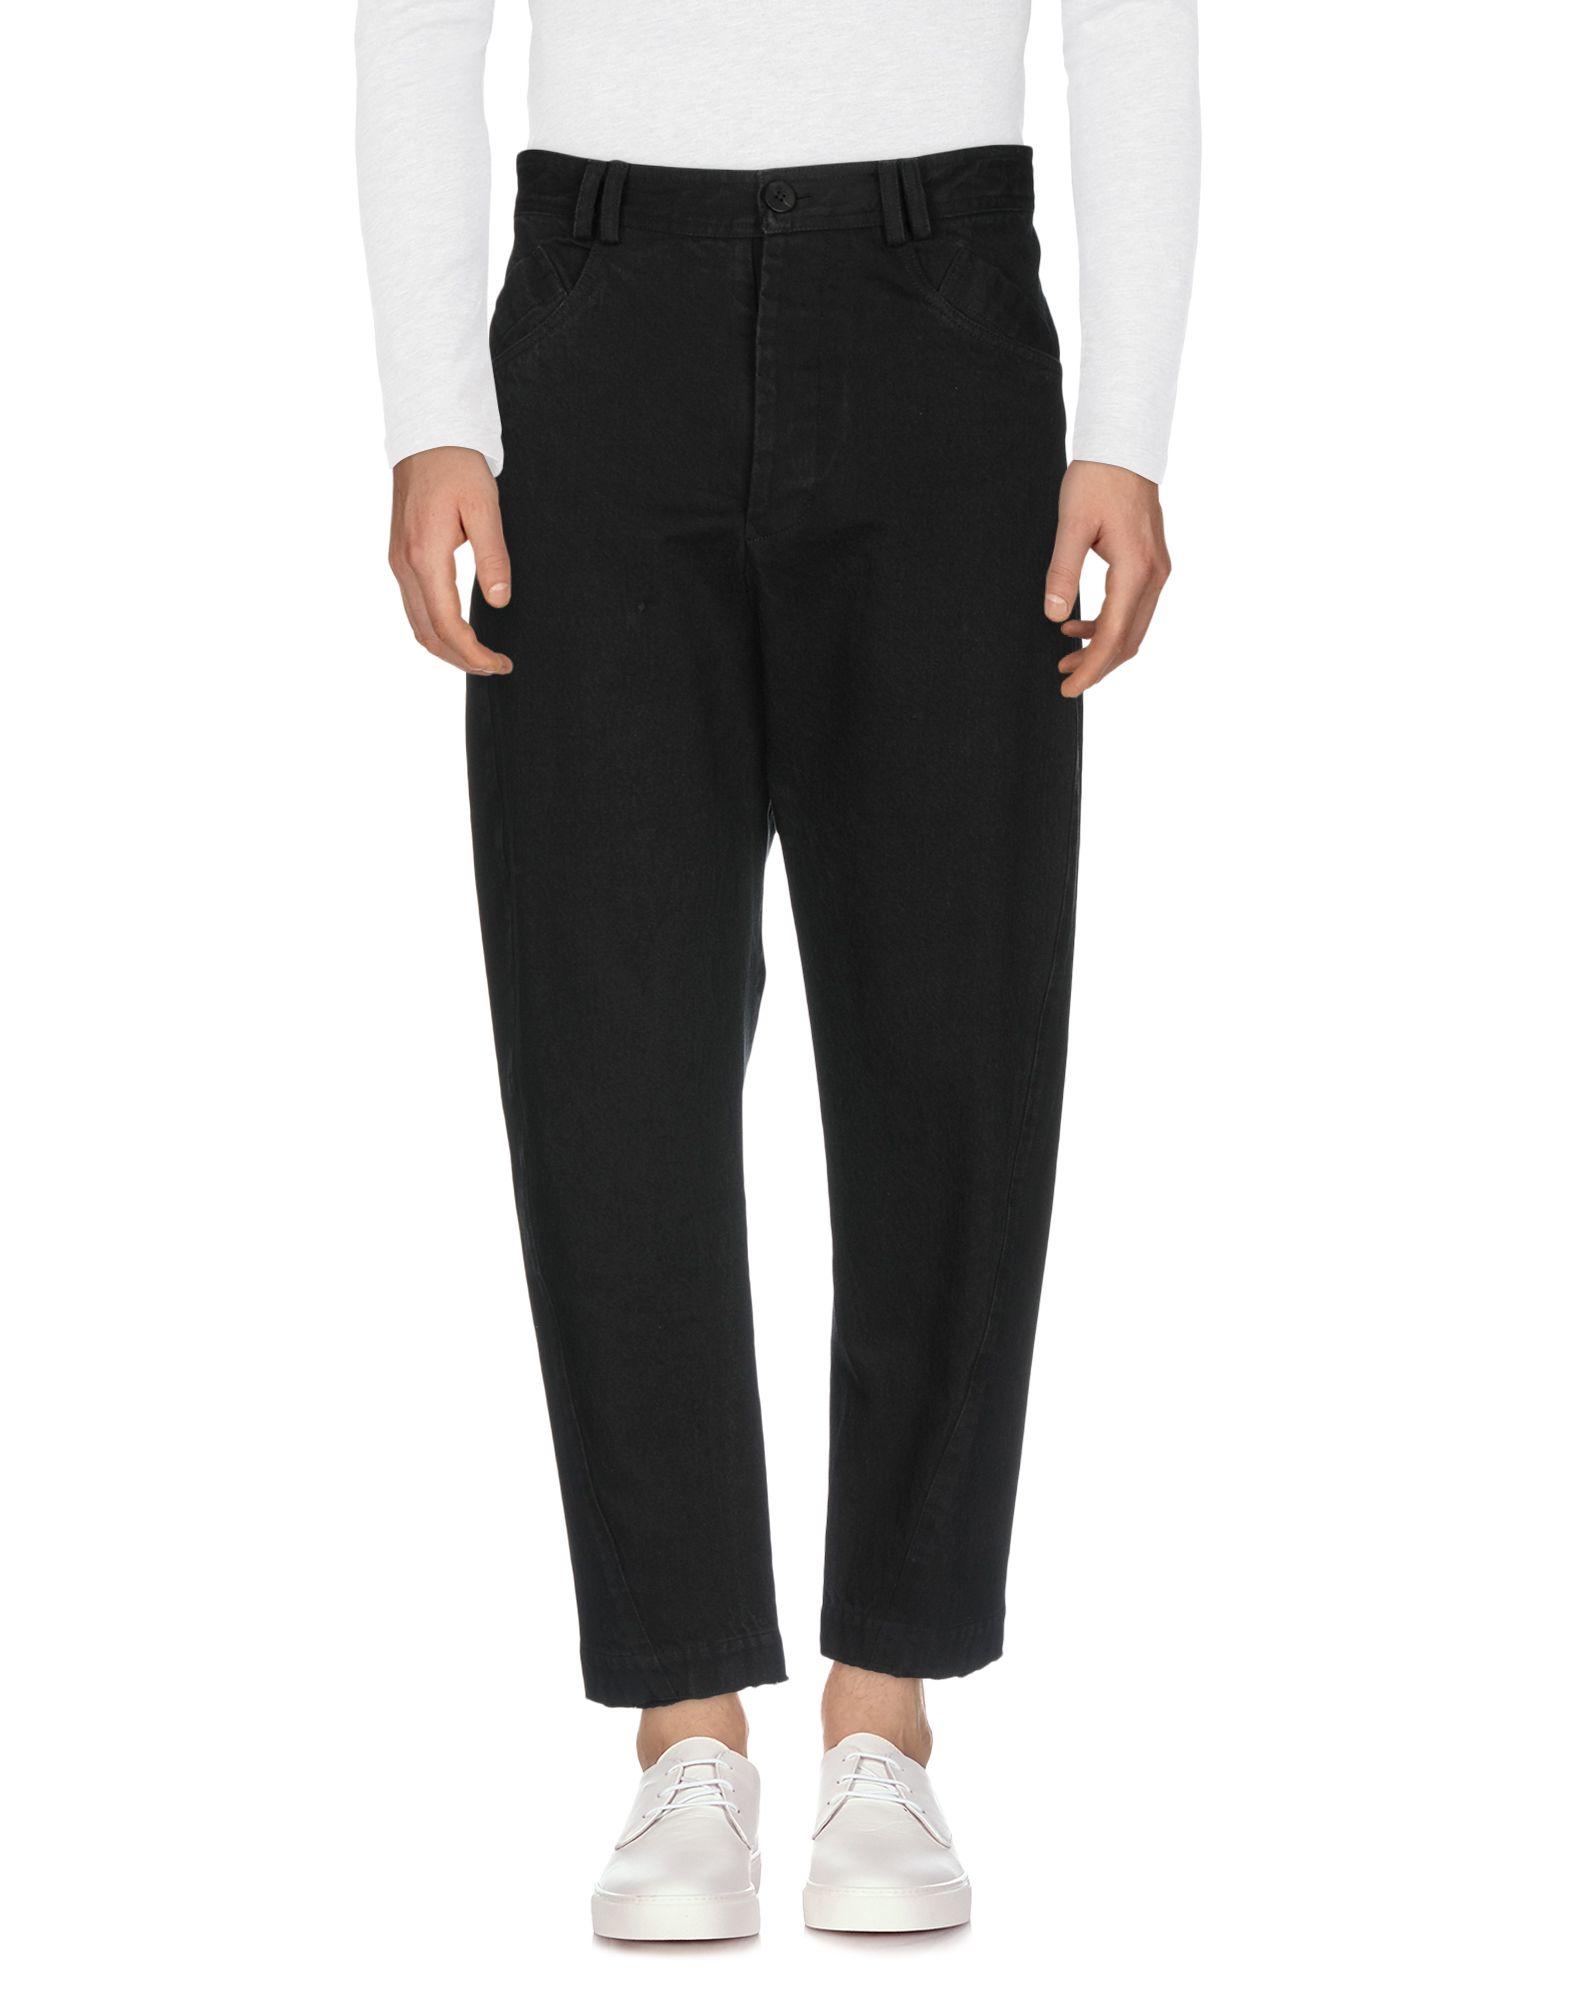 Pantaloni Jeans Isabel Benenato Donna - Acquista online su